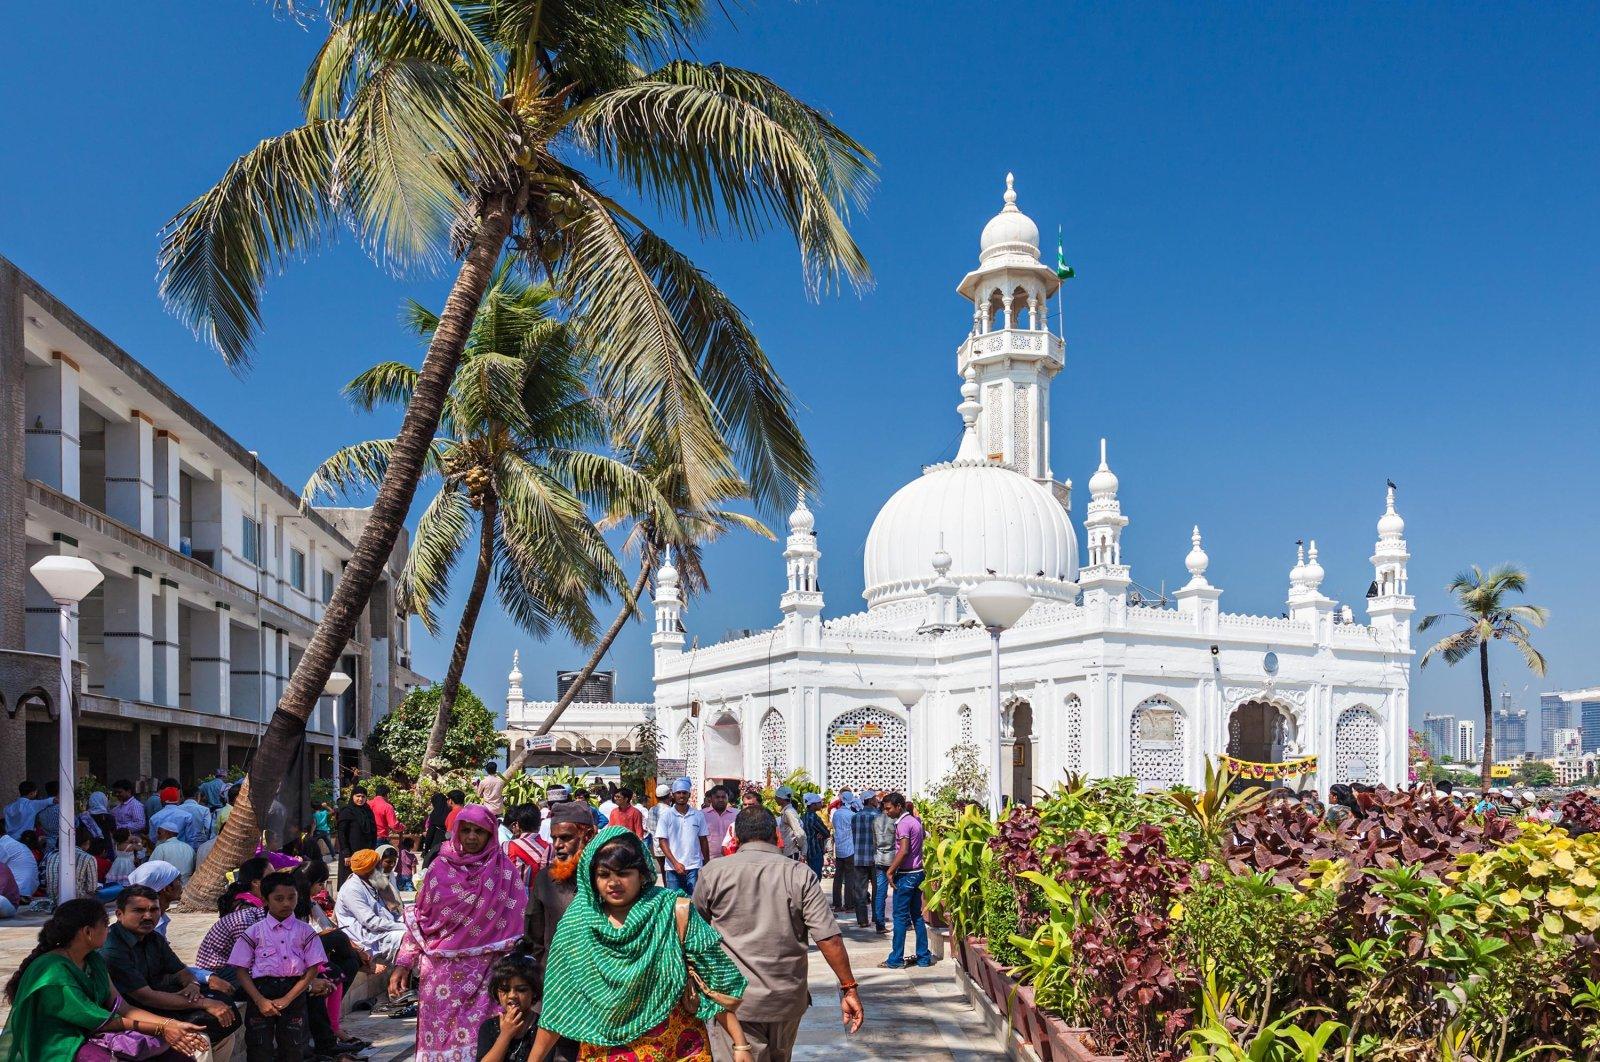 People are seen in front of the Haji Ali Dargah, Feb. 27, 2014, Mumbai, India. (Shutterstock Photo)